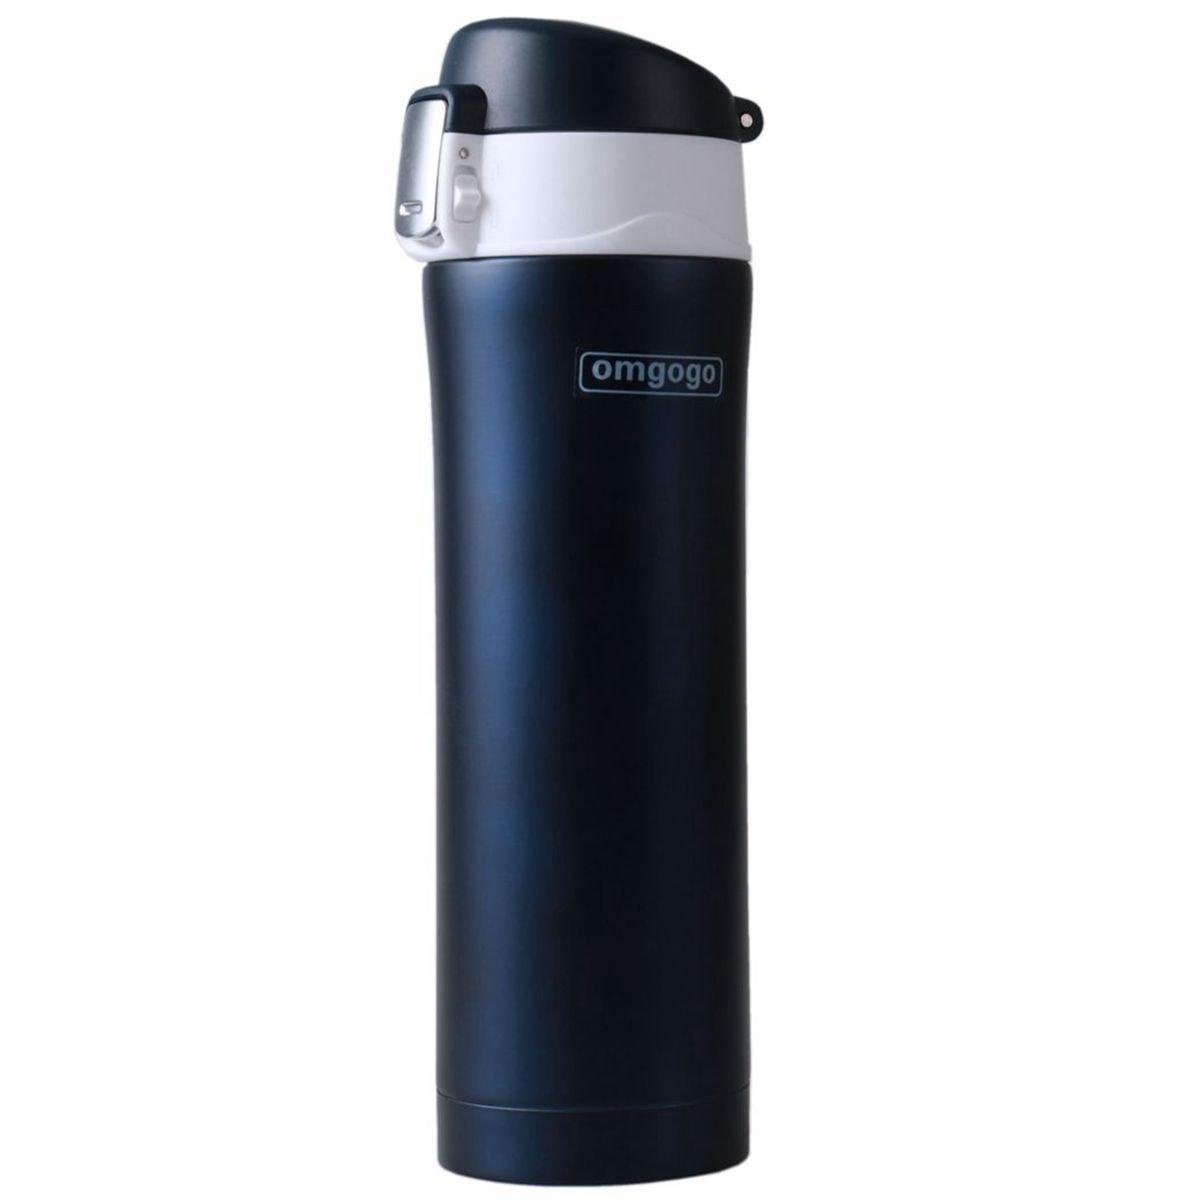 Omgogo Insulated Travel Mug Coffee Mugs Stainless Steel Lid Lock Prevents Leaks (16oz Blue)